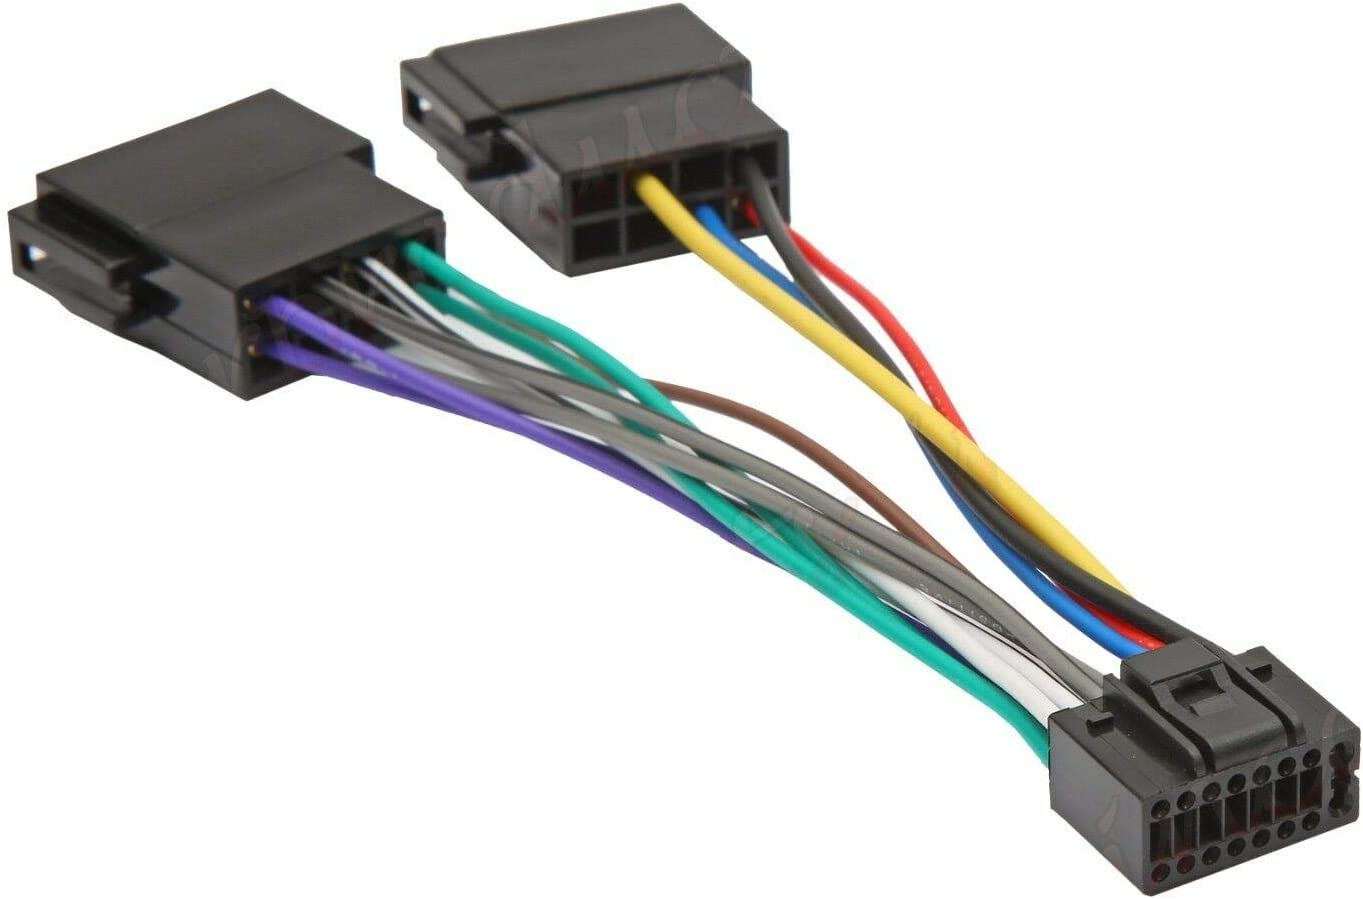 JVC 13 Pin Wiring Harness JVC Car Stereo Wiring HarnessPepa Bonett